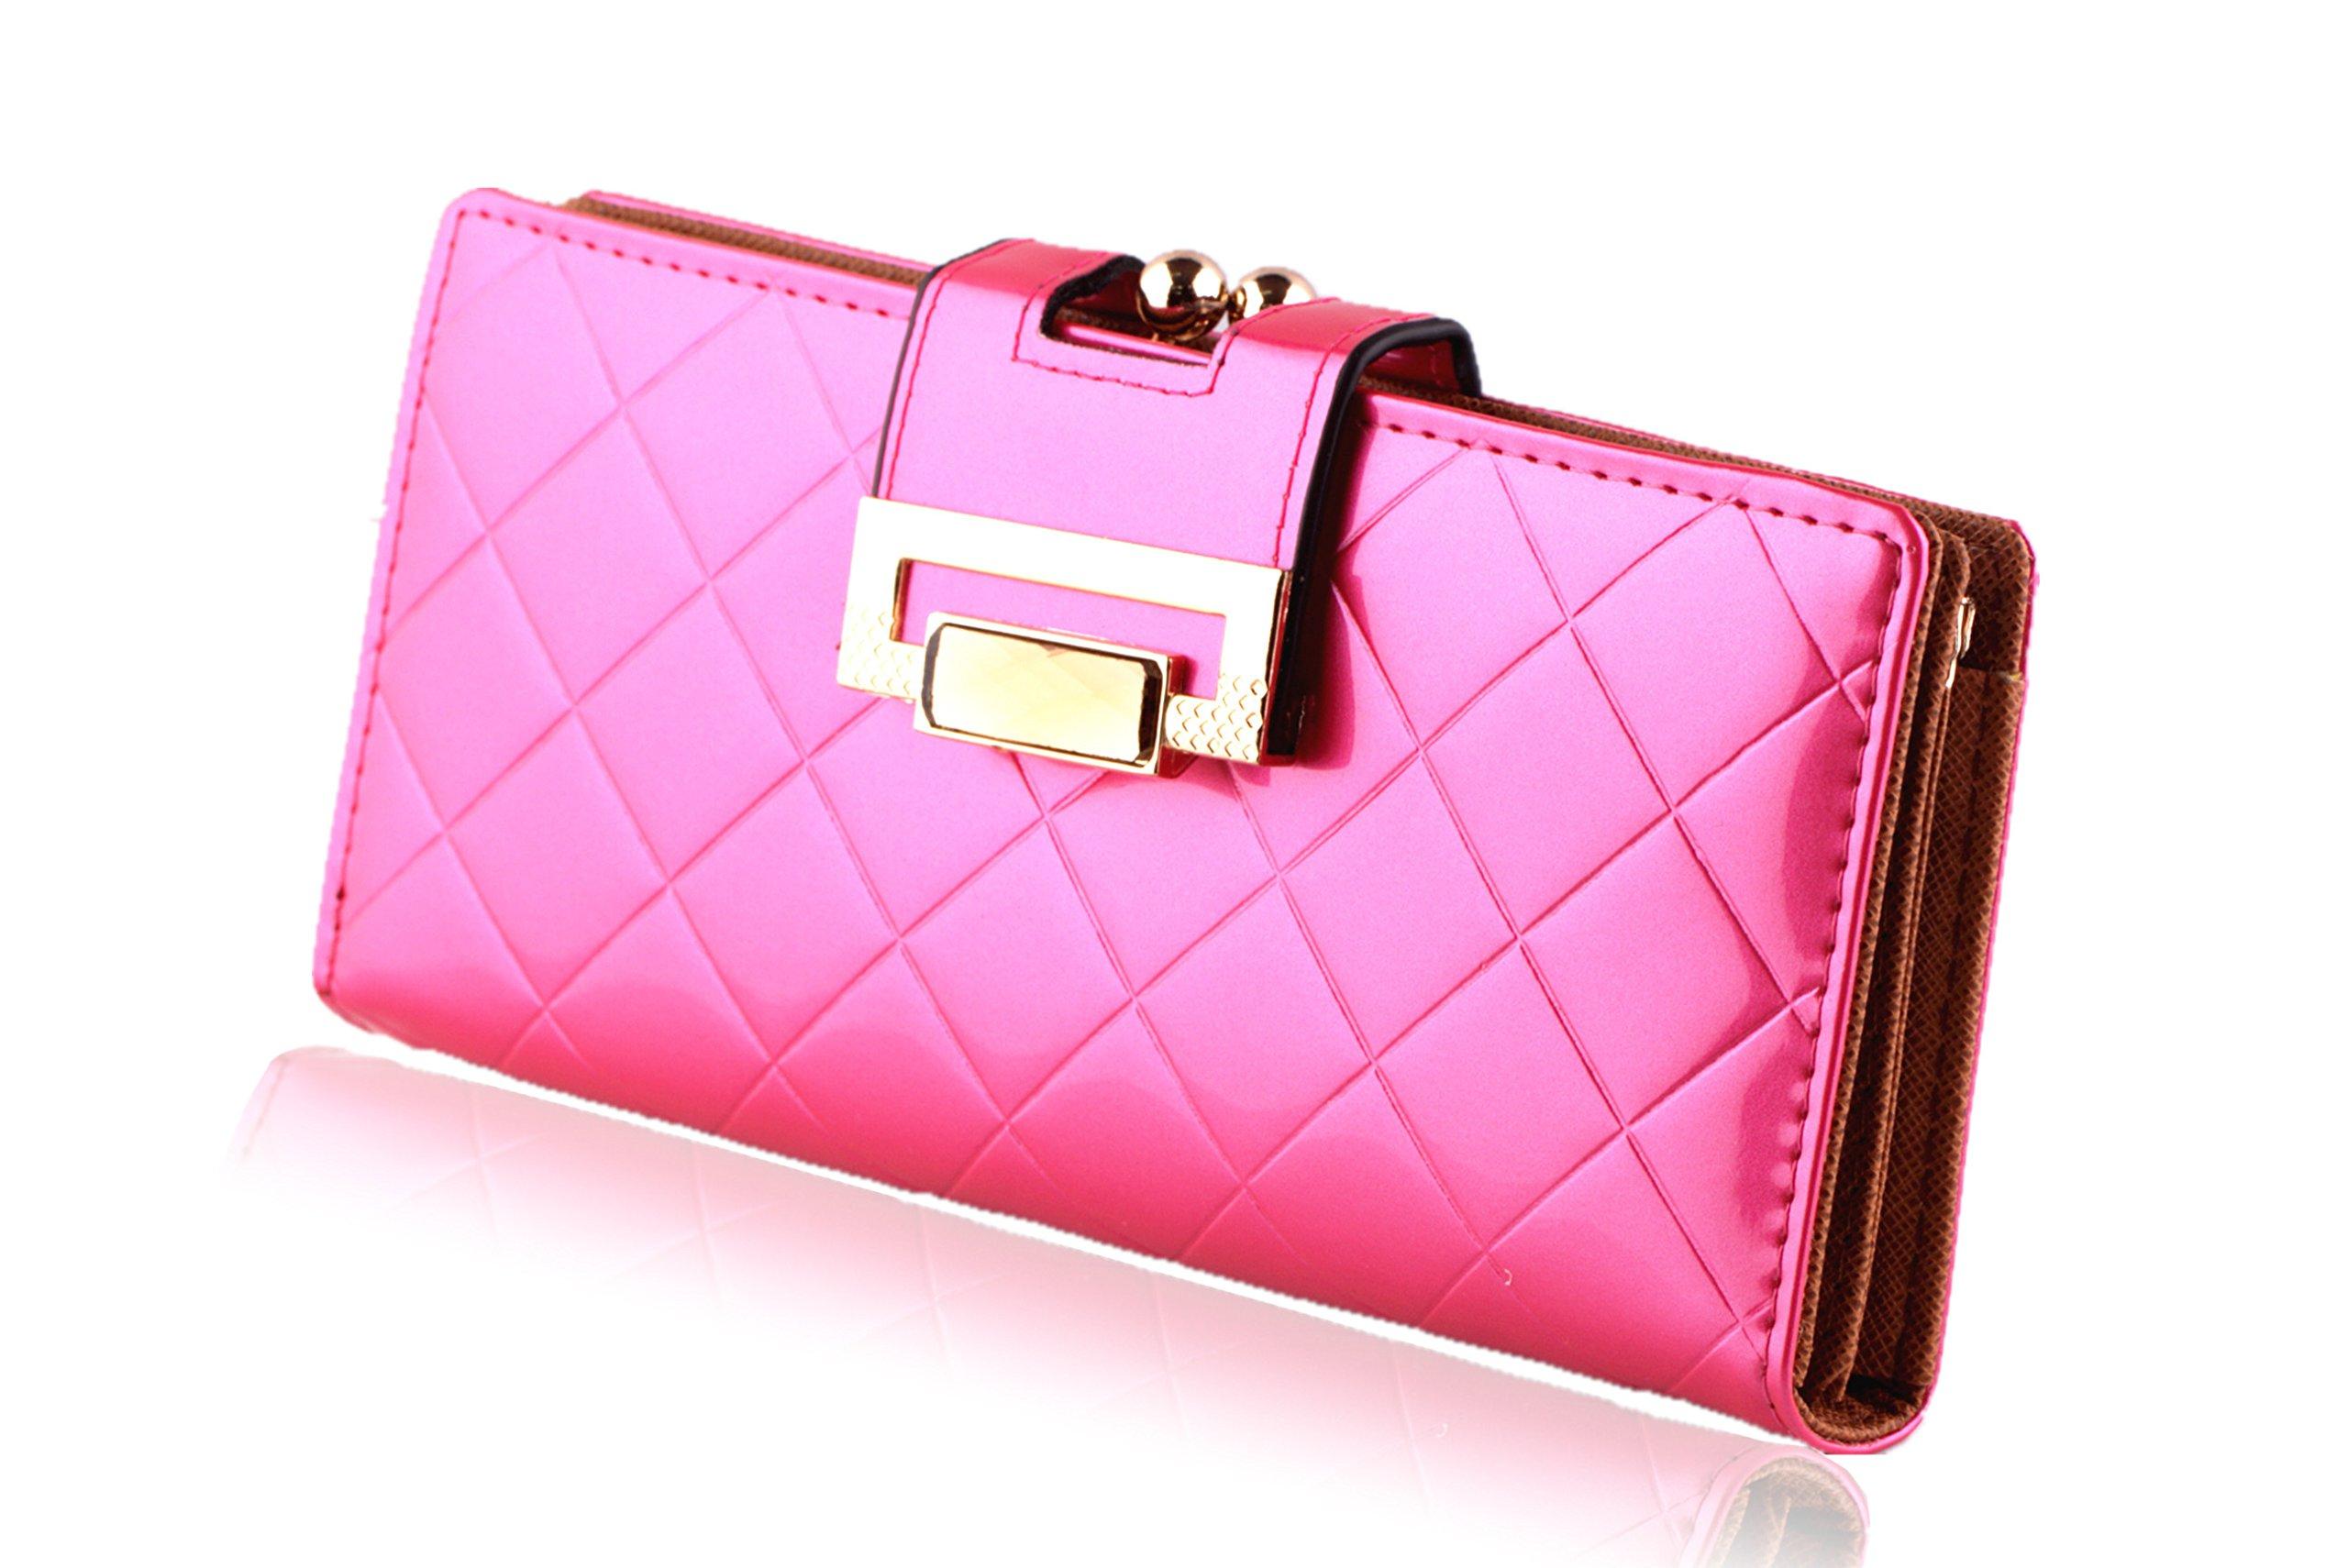 LBS Women's Fashion Style Multi Functional Wallet Purse Handbag (Shinny Fuchsia)